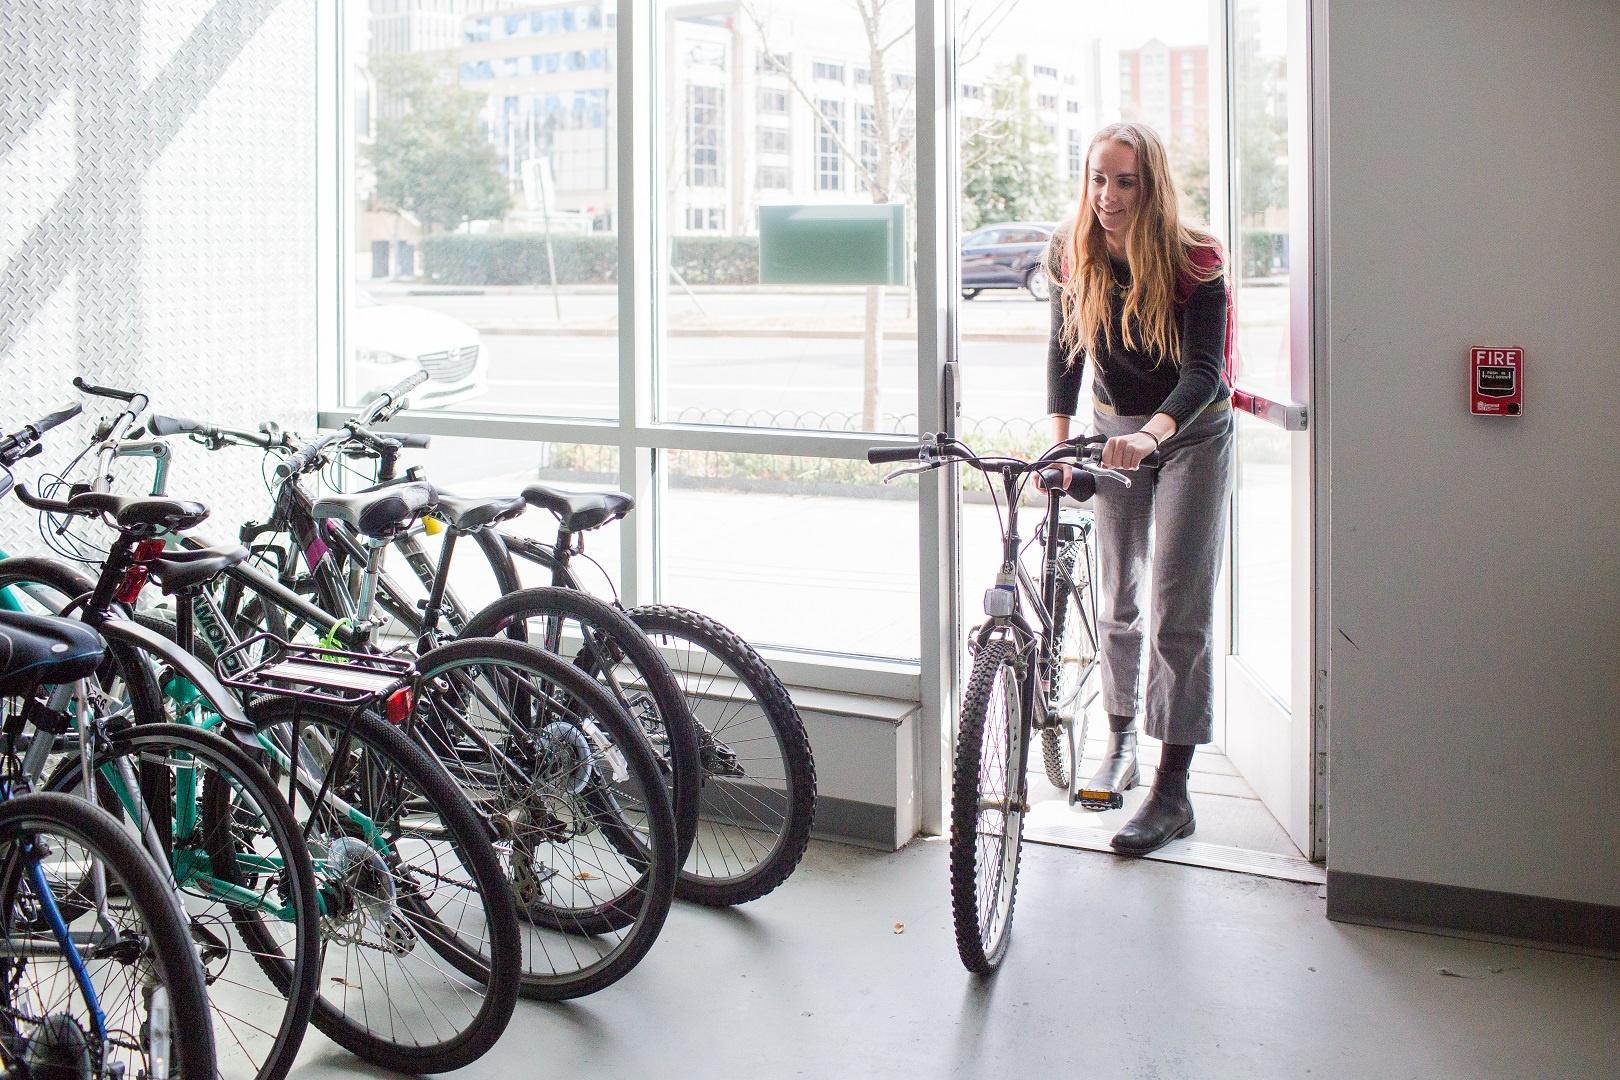 20181115-street-bike-room